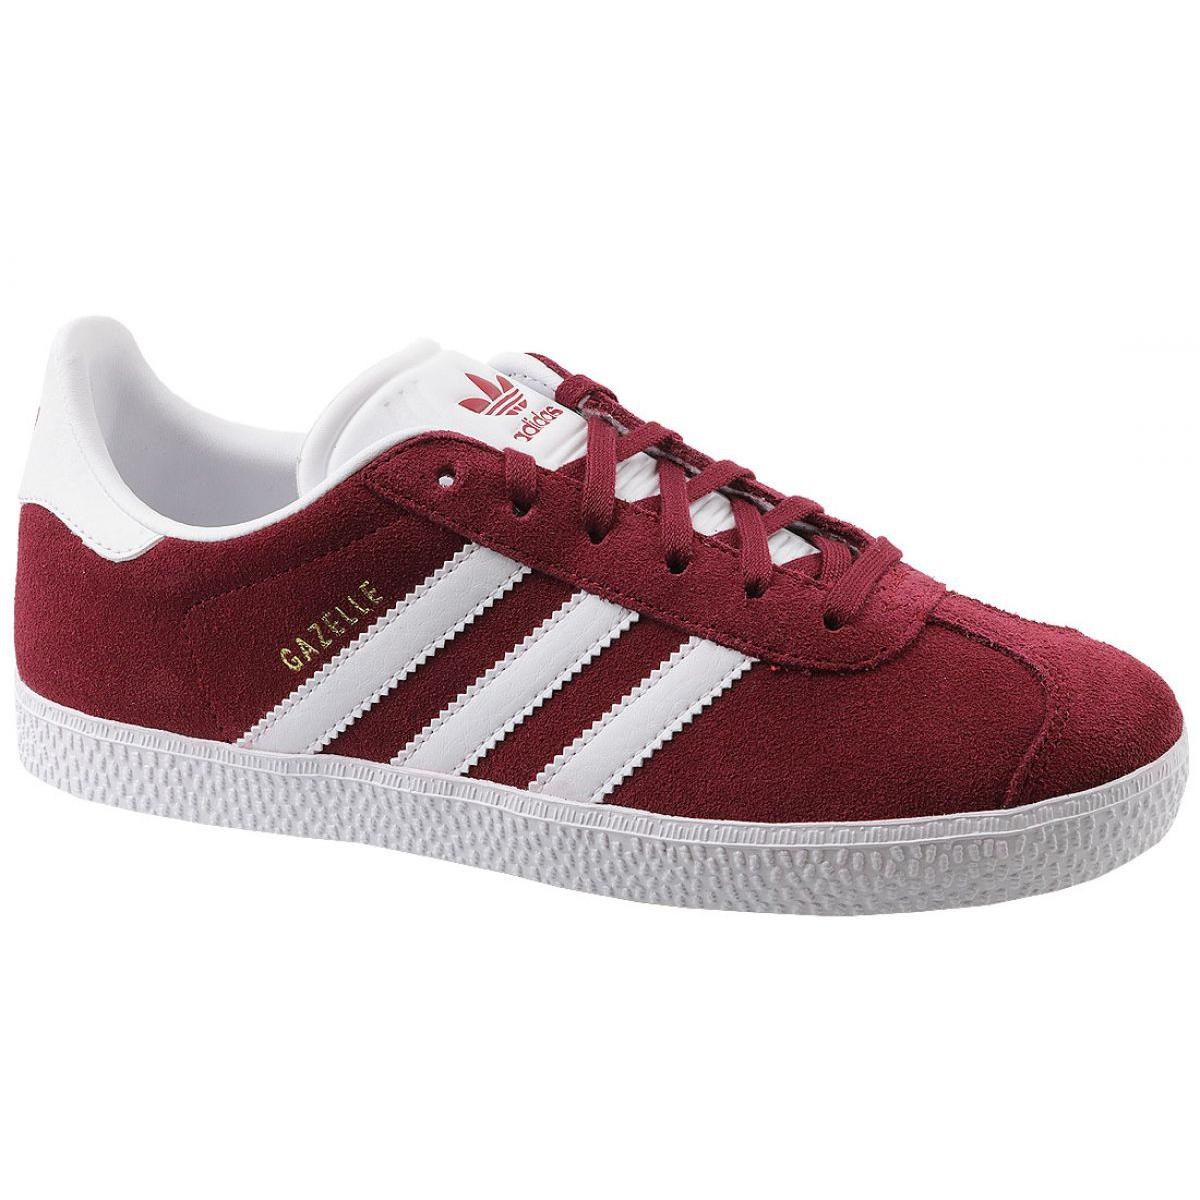 2gazelle adidas rosse